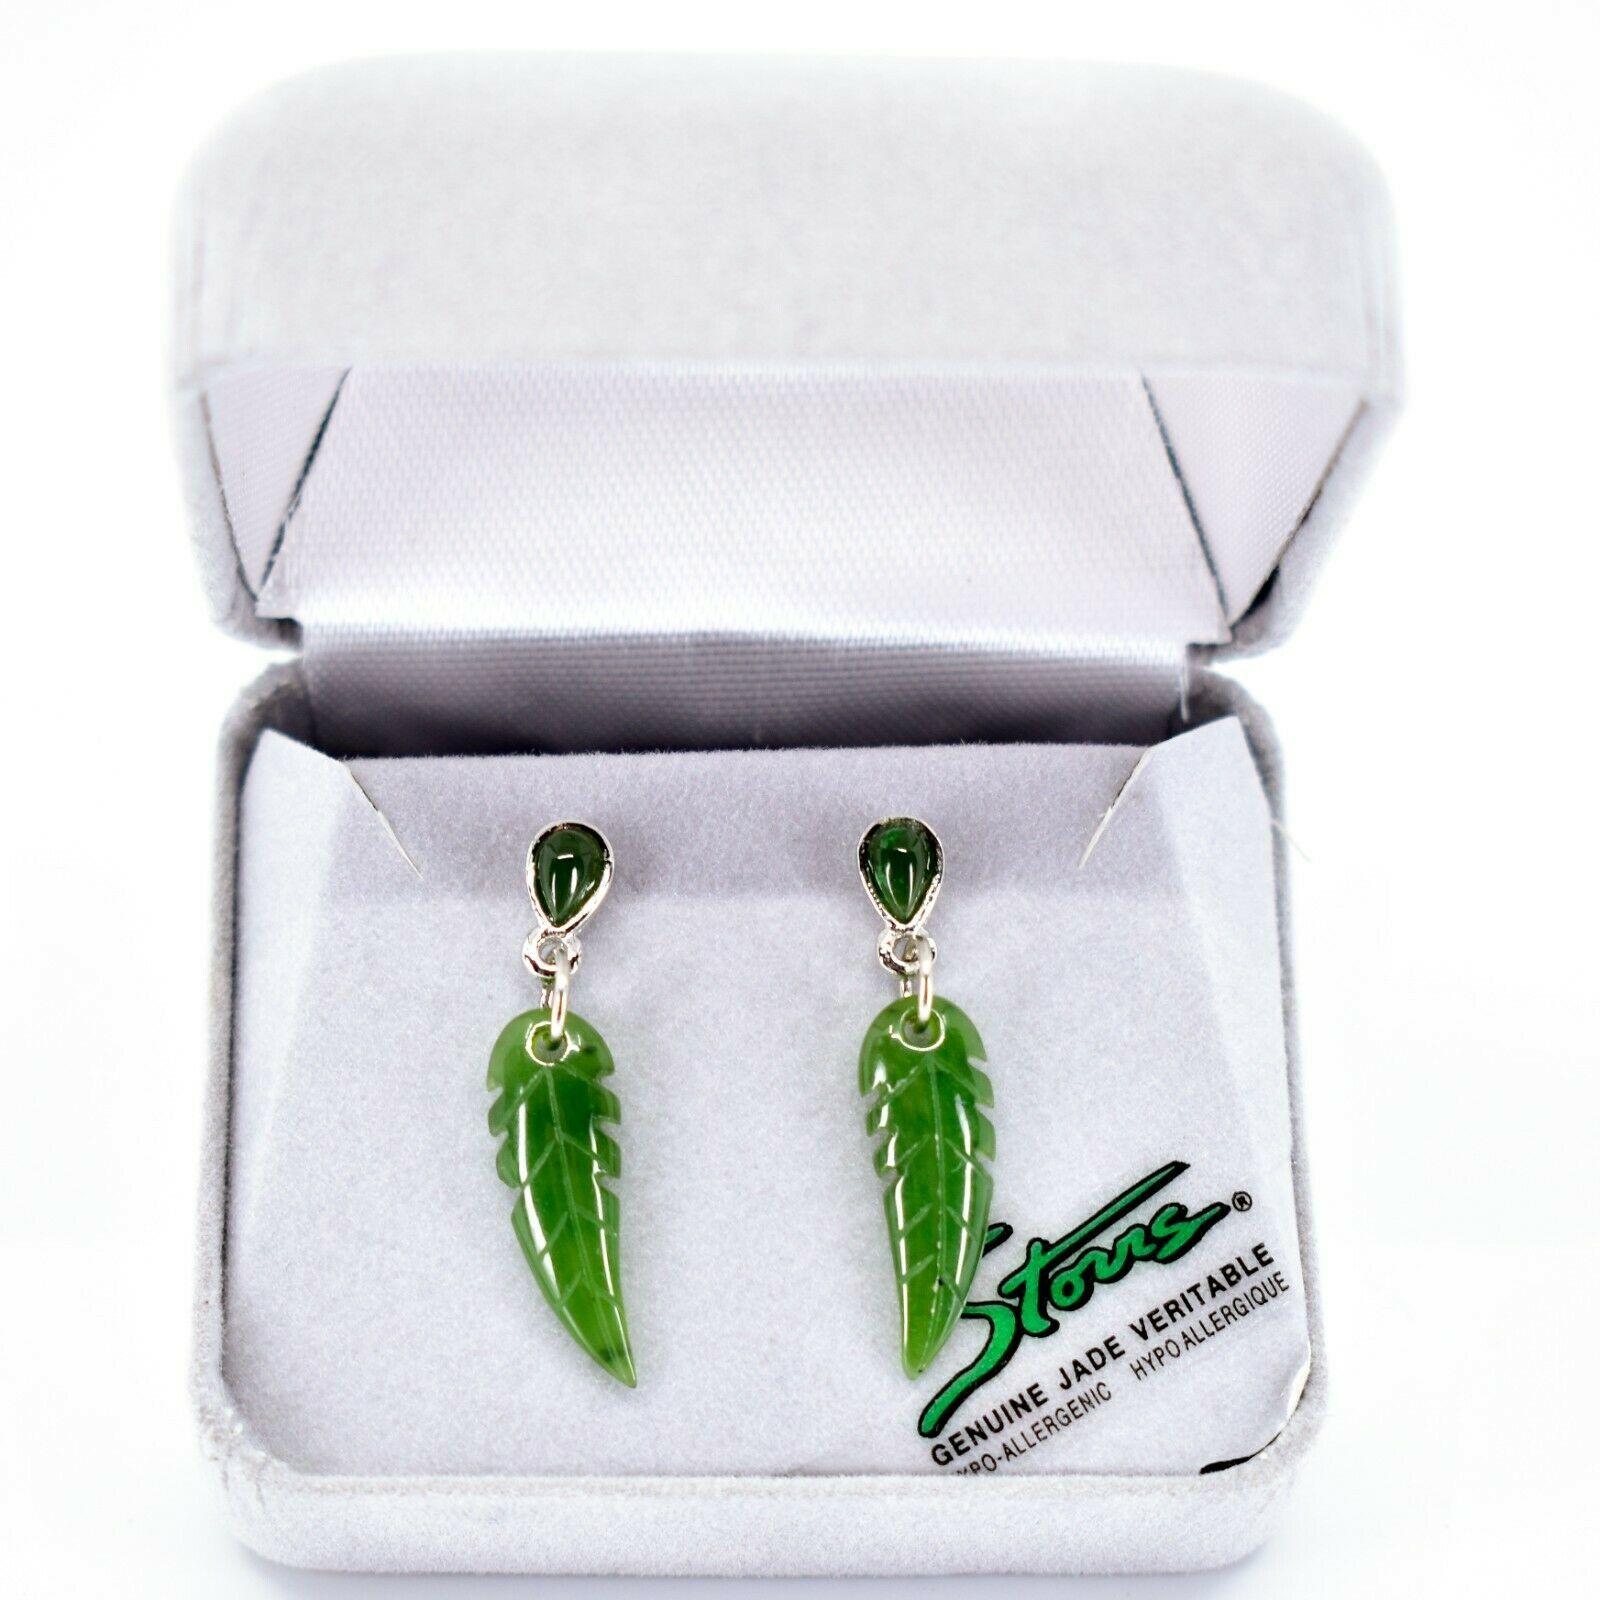 Storrs Hand Carved Genuine Jade Veritable Feather Earrings